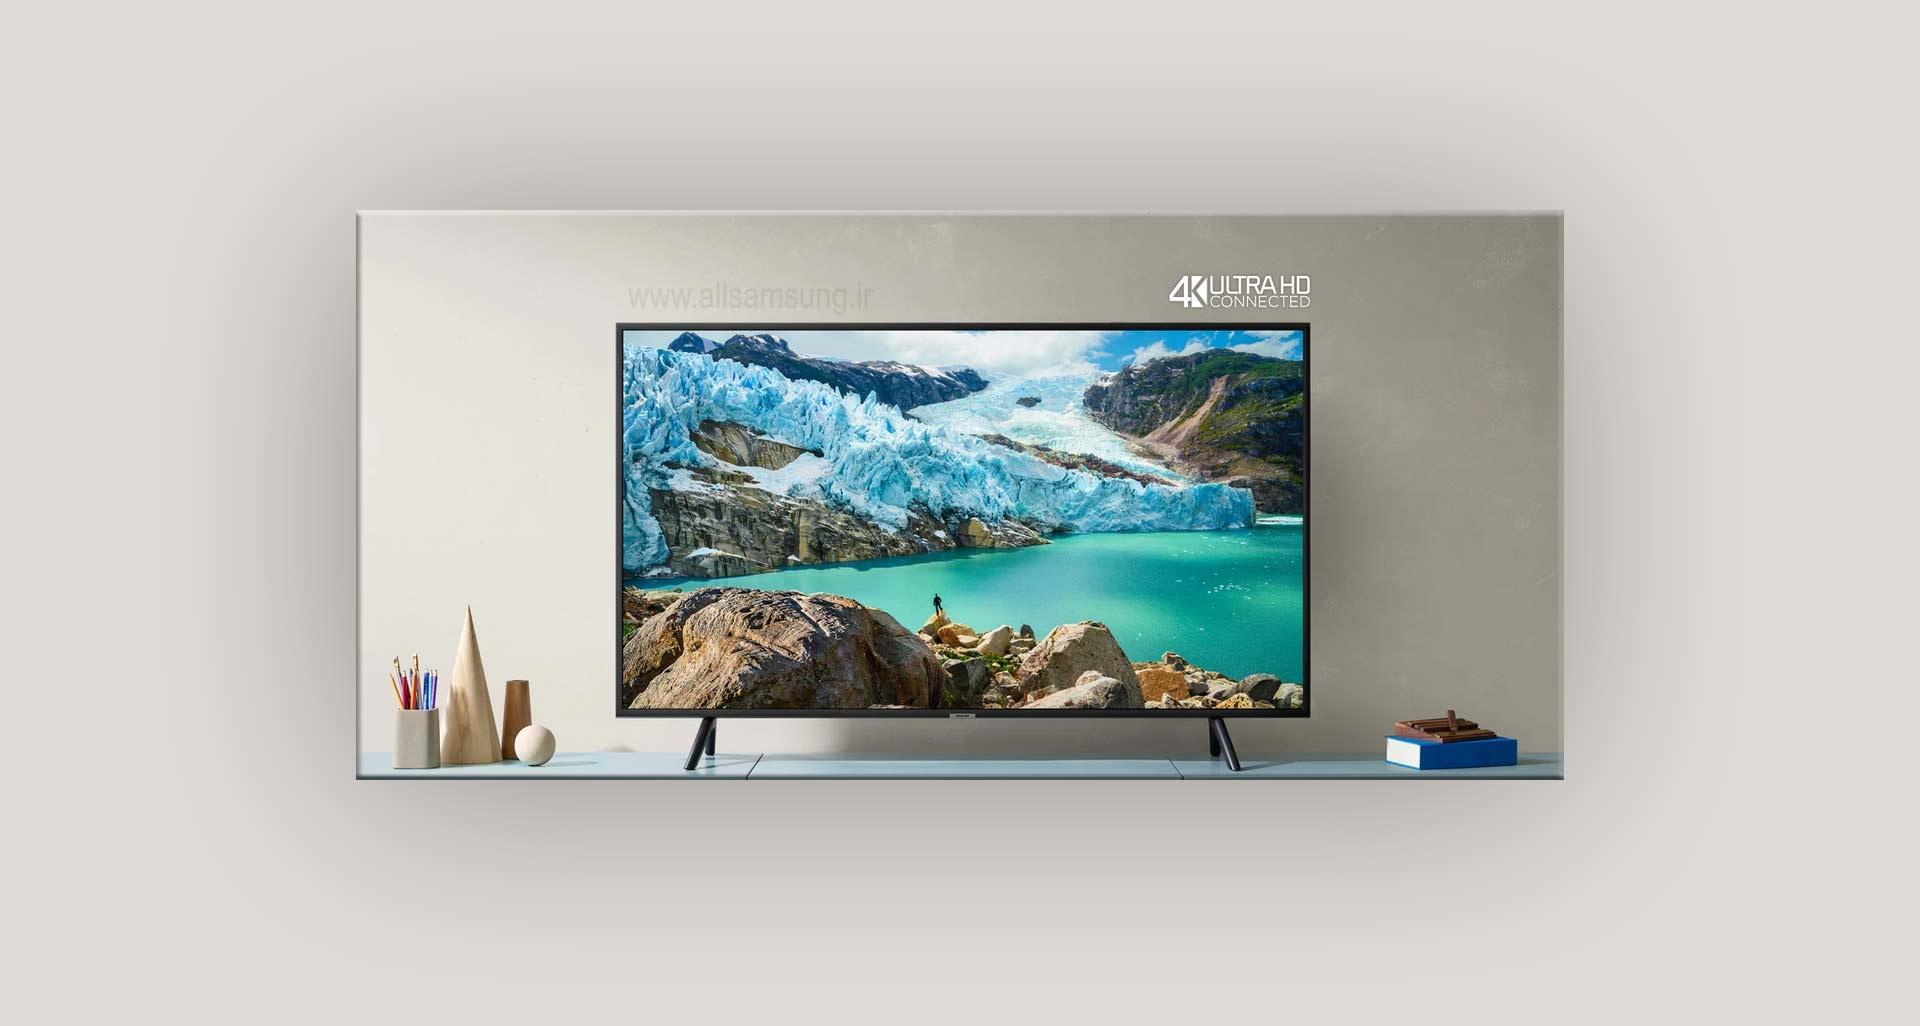 کشف کیفیت بی نظیر تصویر با تلویزیون RU7100